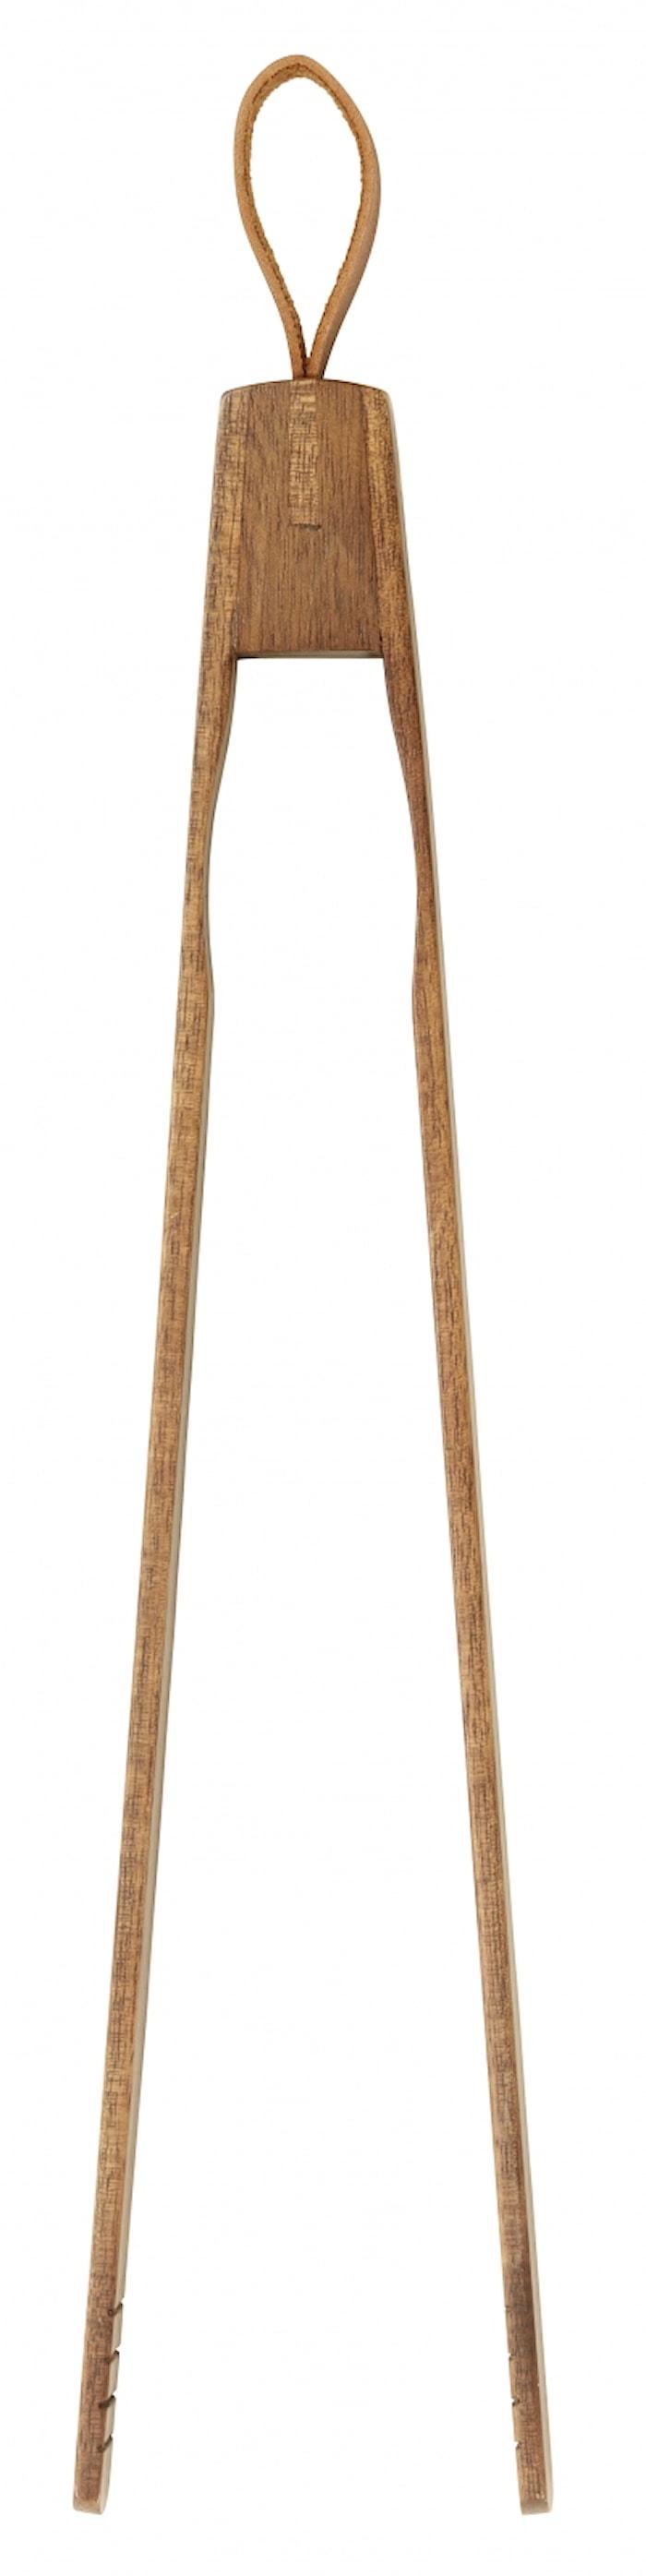 WOODY Kjøkkenklype Wood